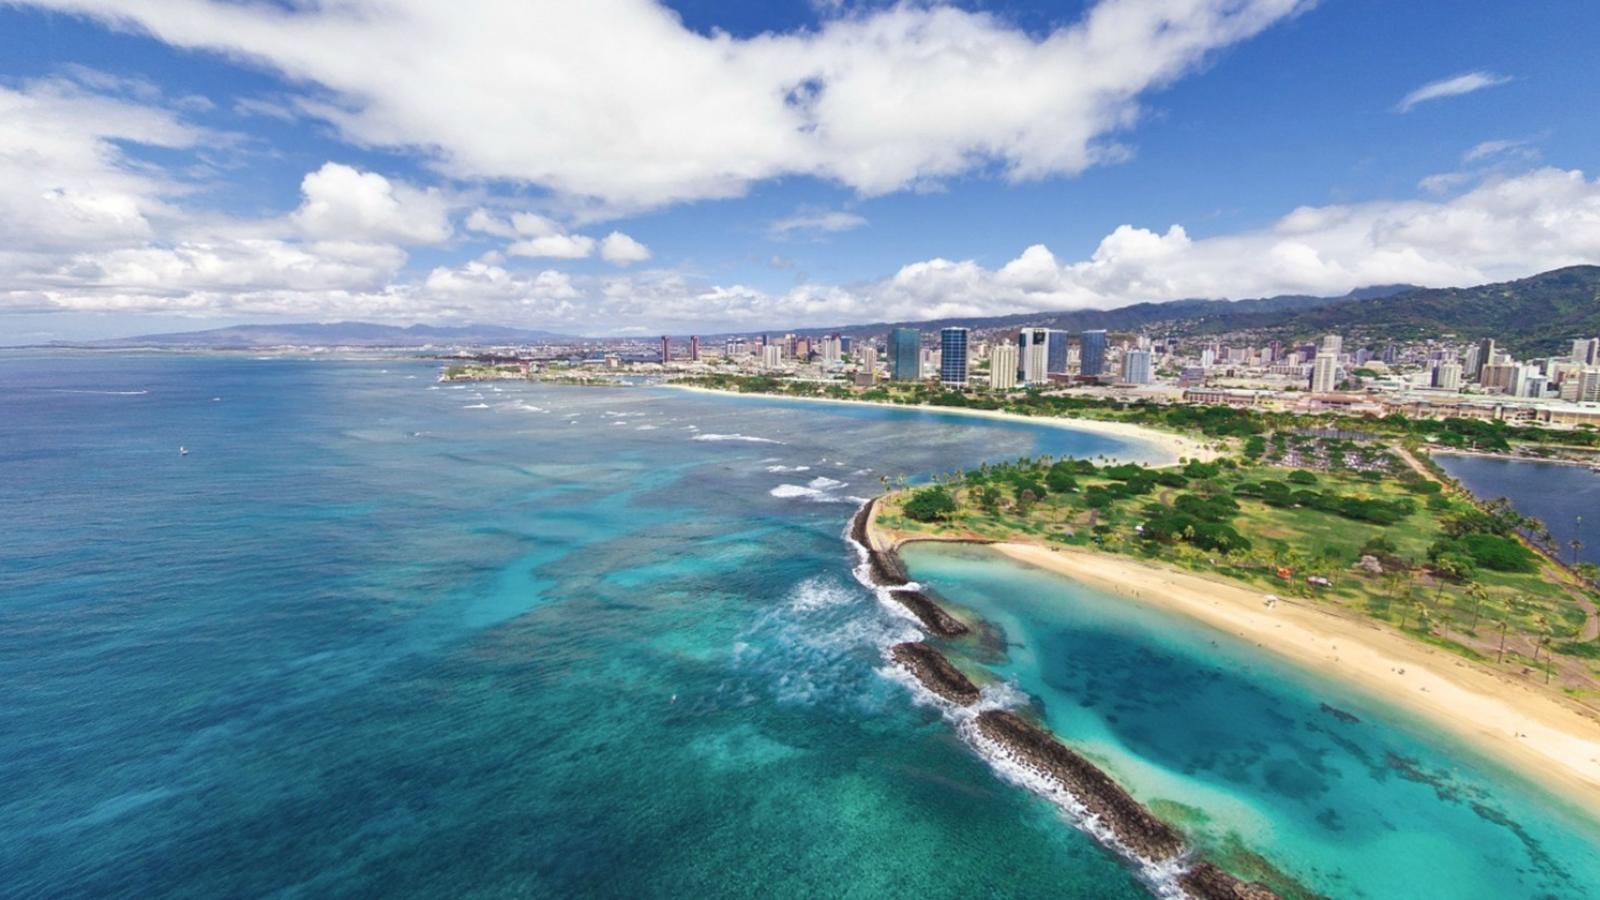 Waikiki Beach Wallpaper Hd: Oahu Hawaii Wallpaper